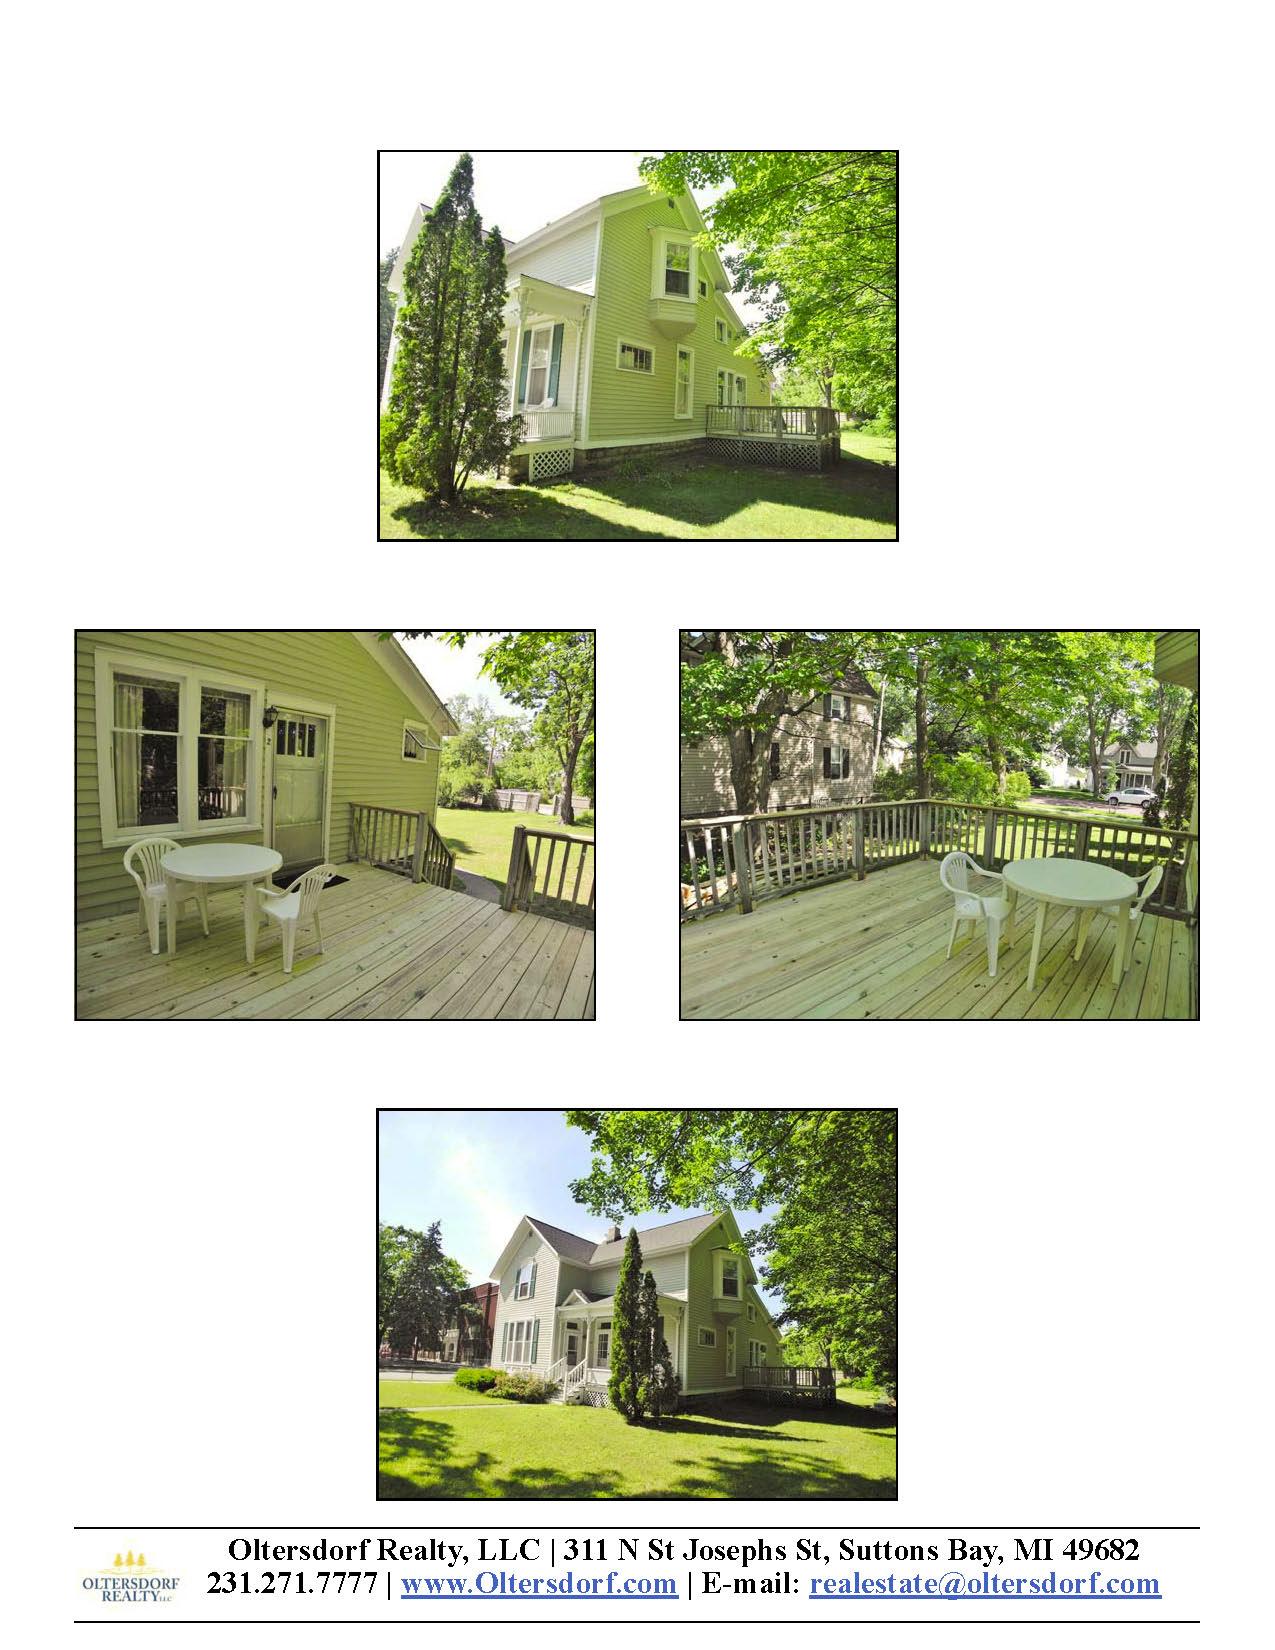 224 W Eighth St, Traverse City, MI – Downtown Traverse City Triplex Marketing Packet - For sale by Oltersdorf Realty LLC (3).jpg